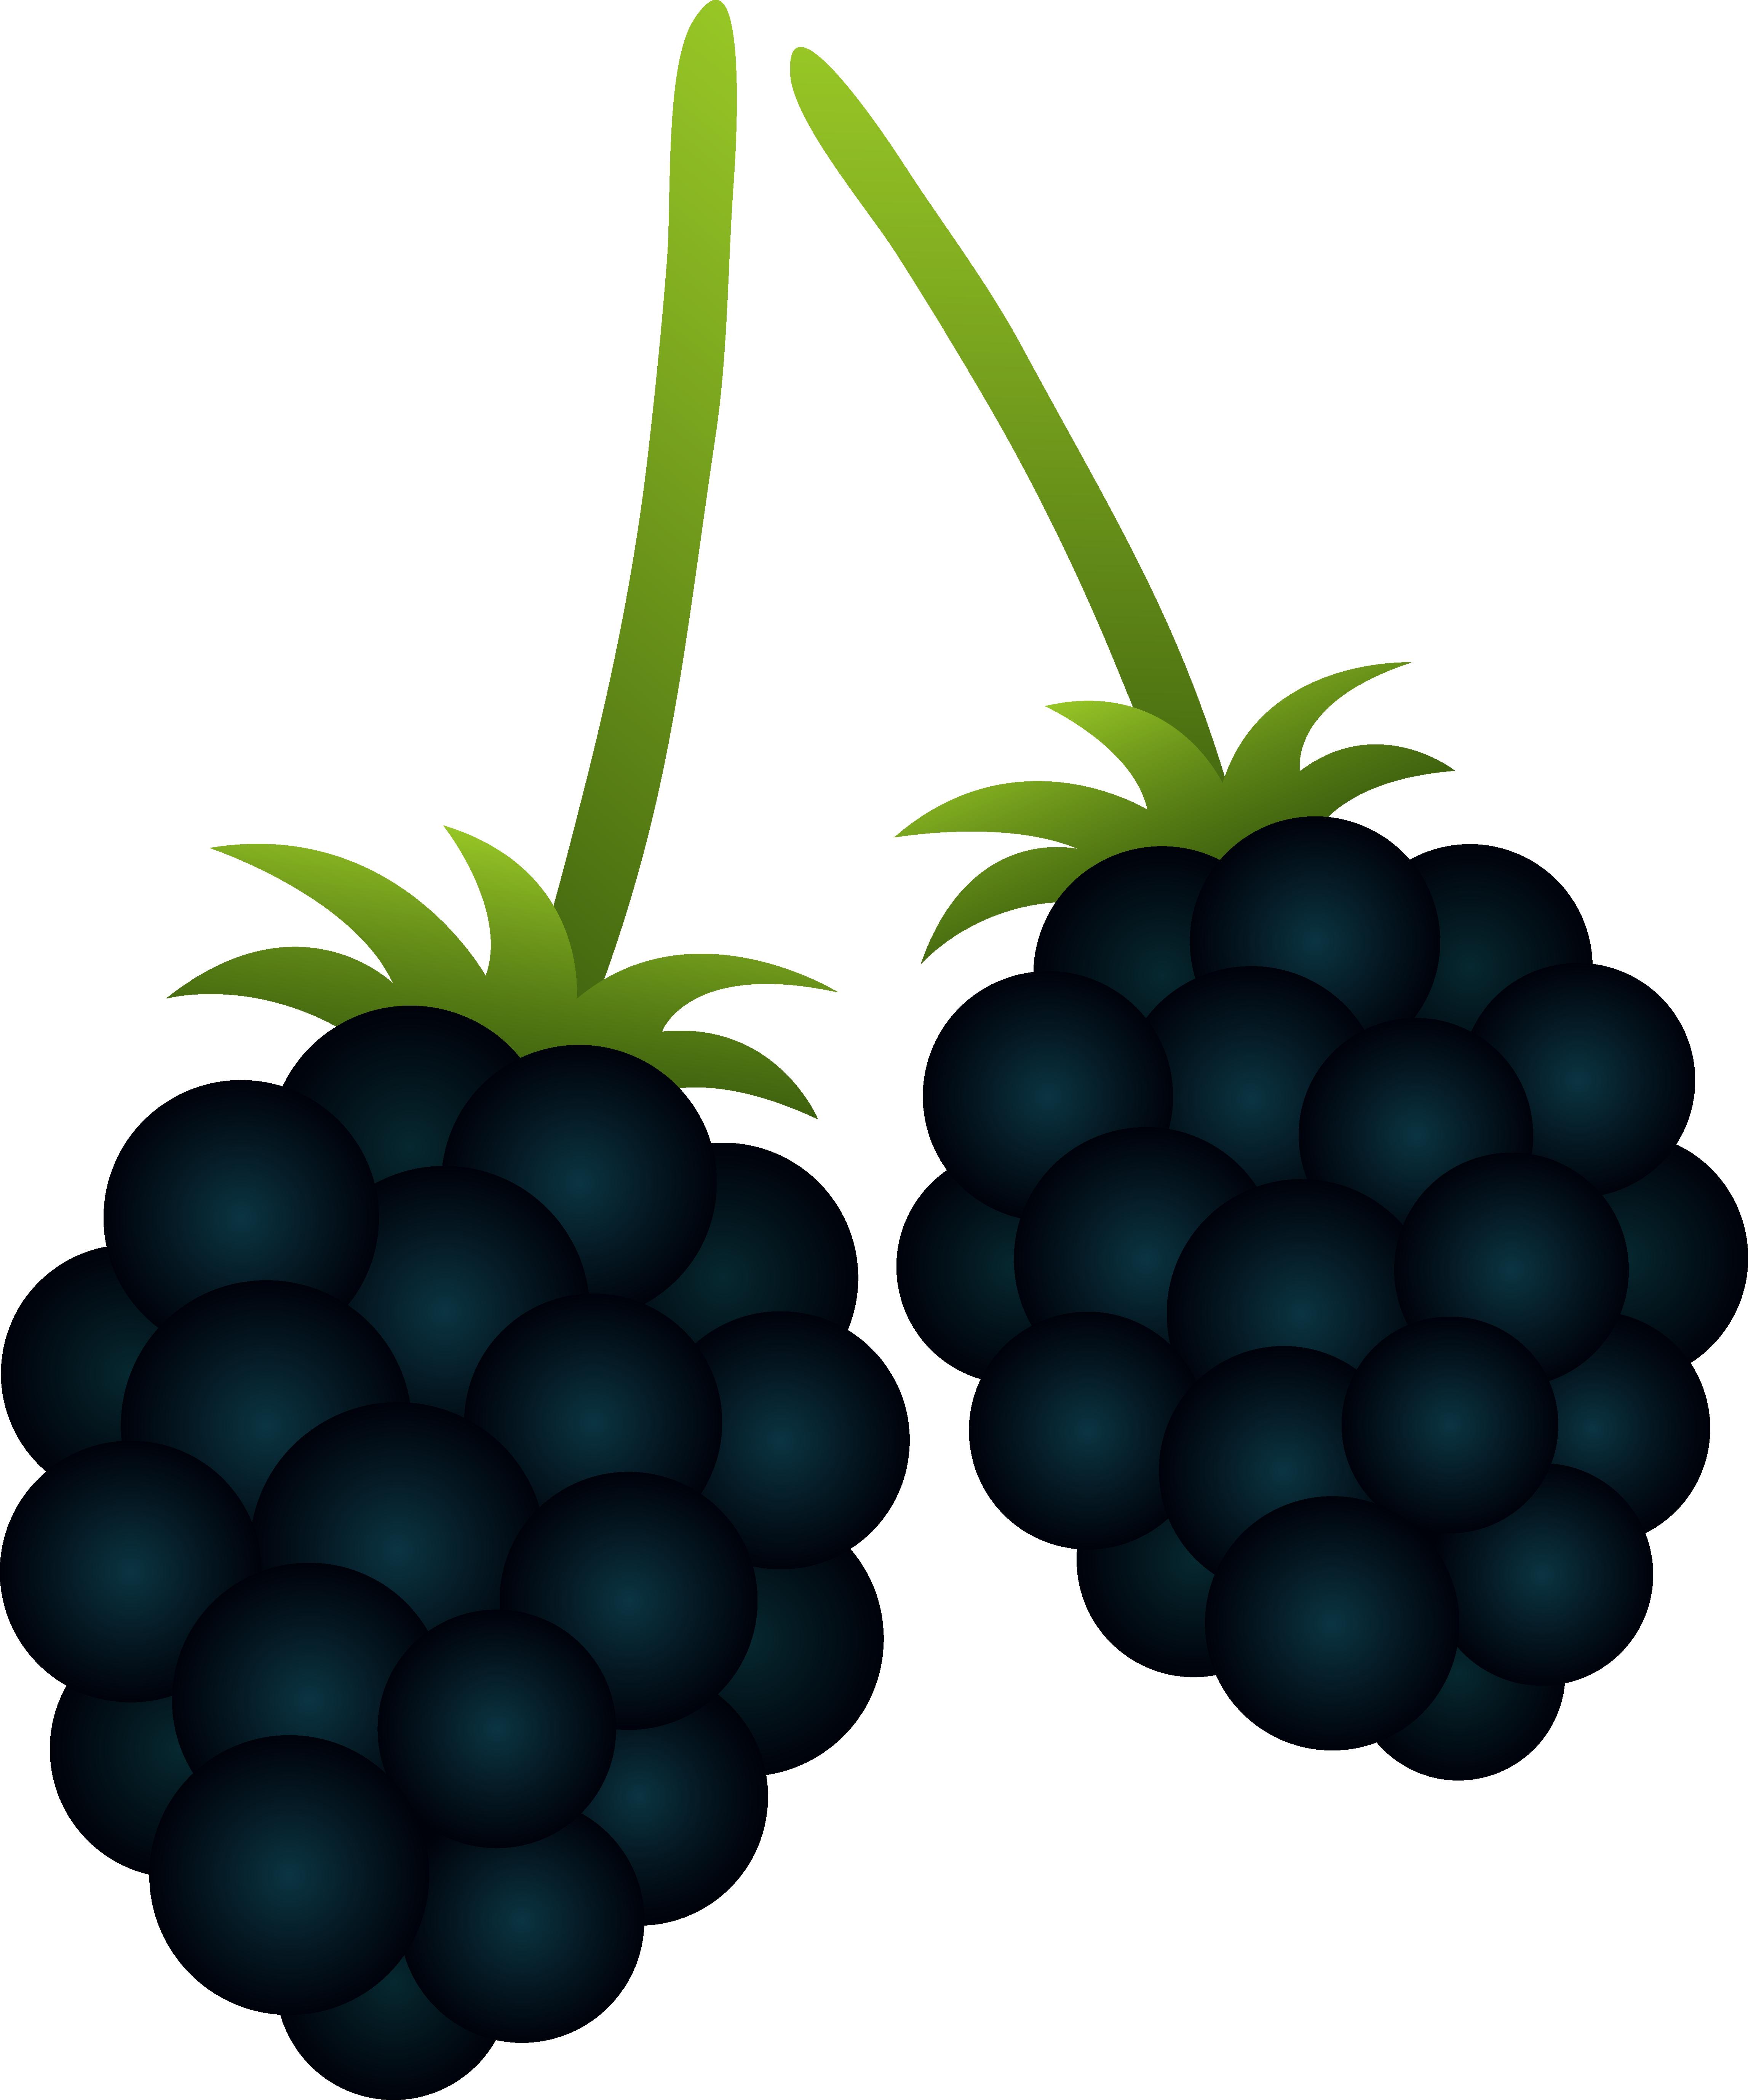 Blackberry logo clip art clip art freeuse Blackberry logo clip art - ClipartNinja clip art freeuse